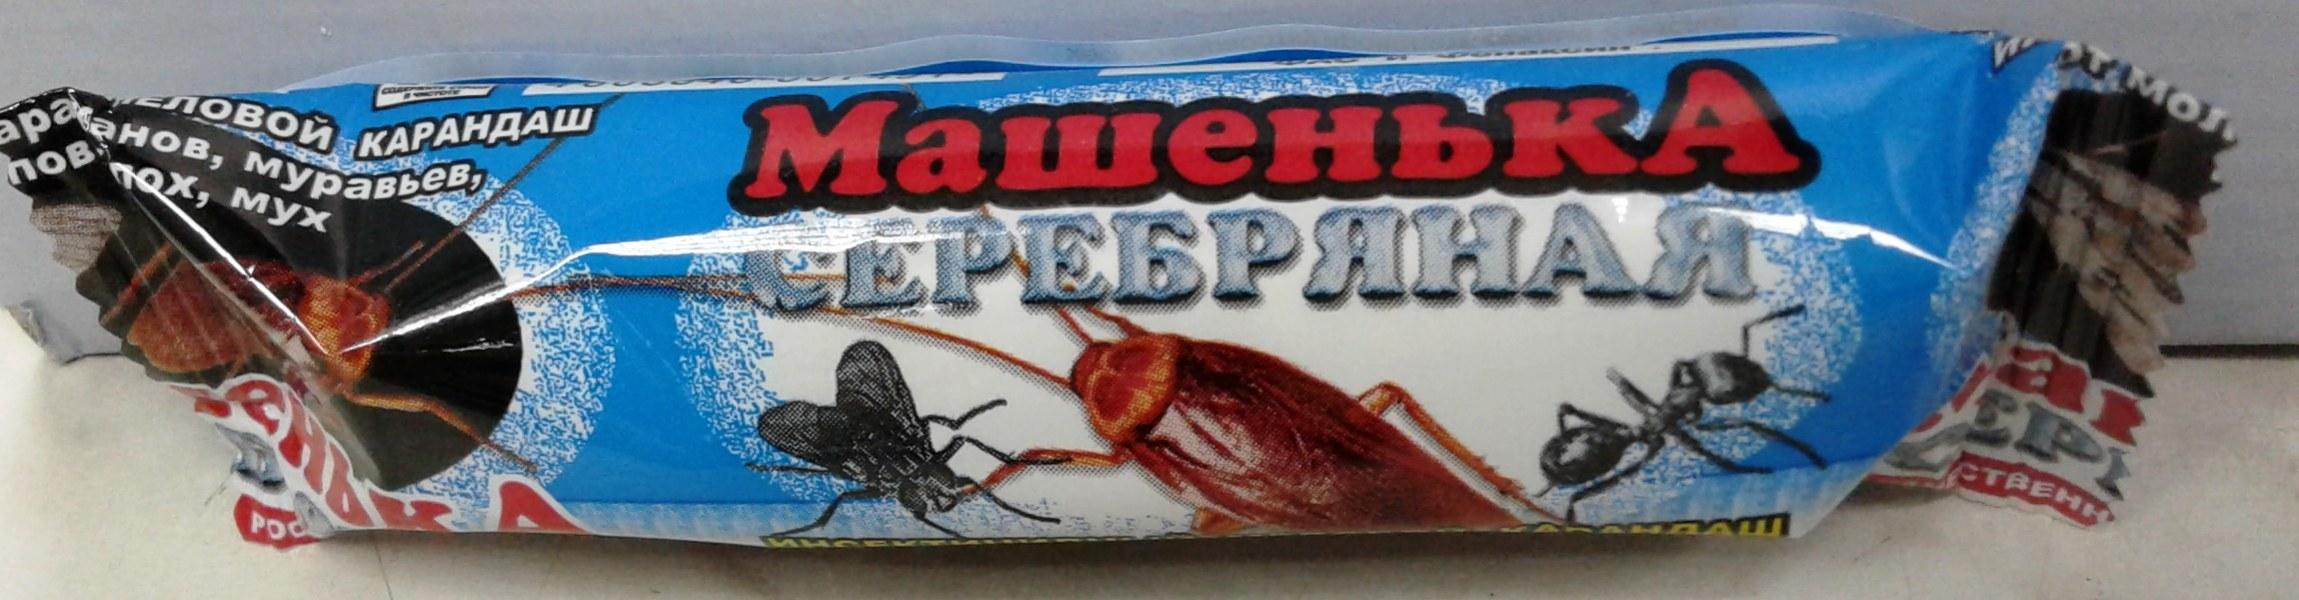 Картинка мелок для тараканов